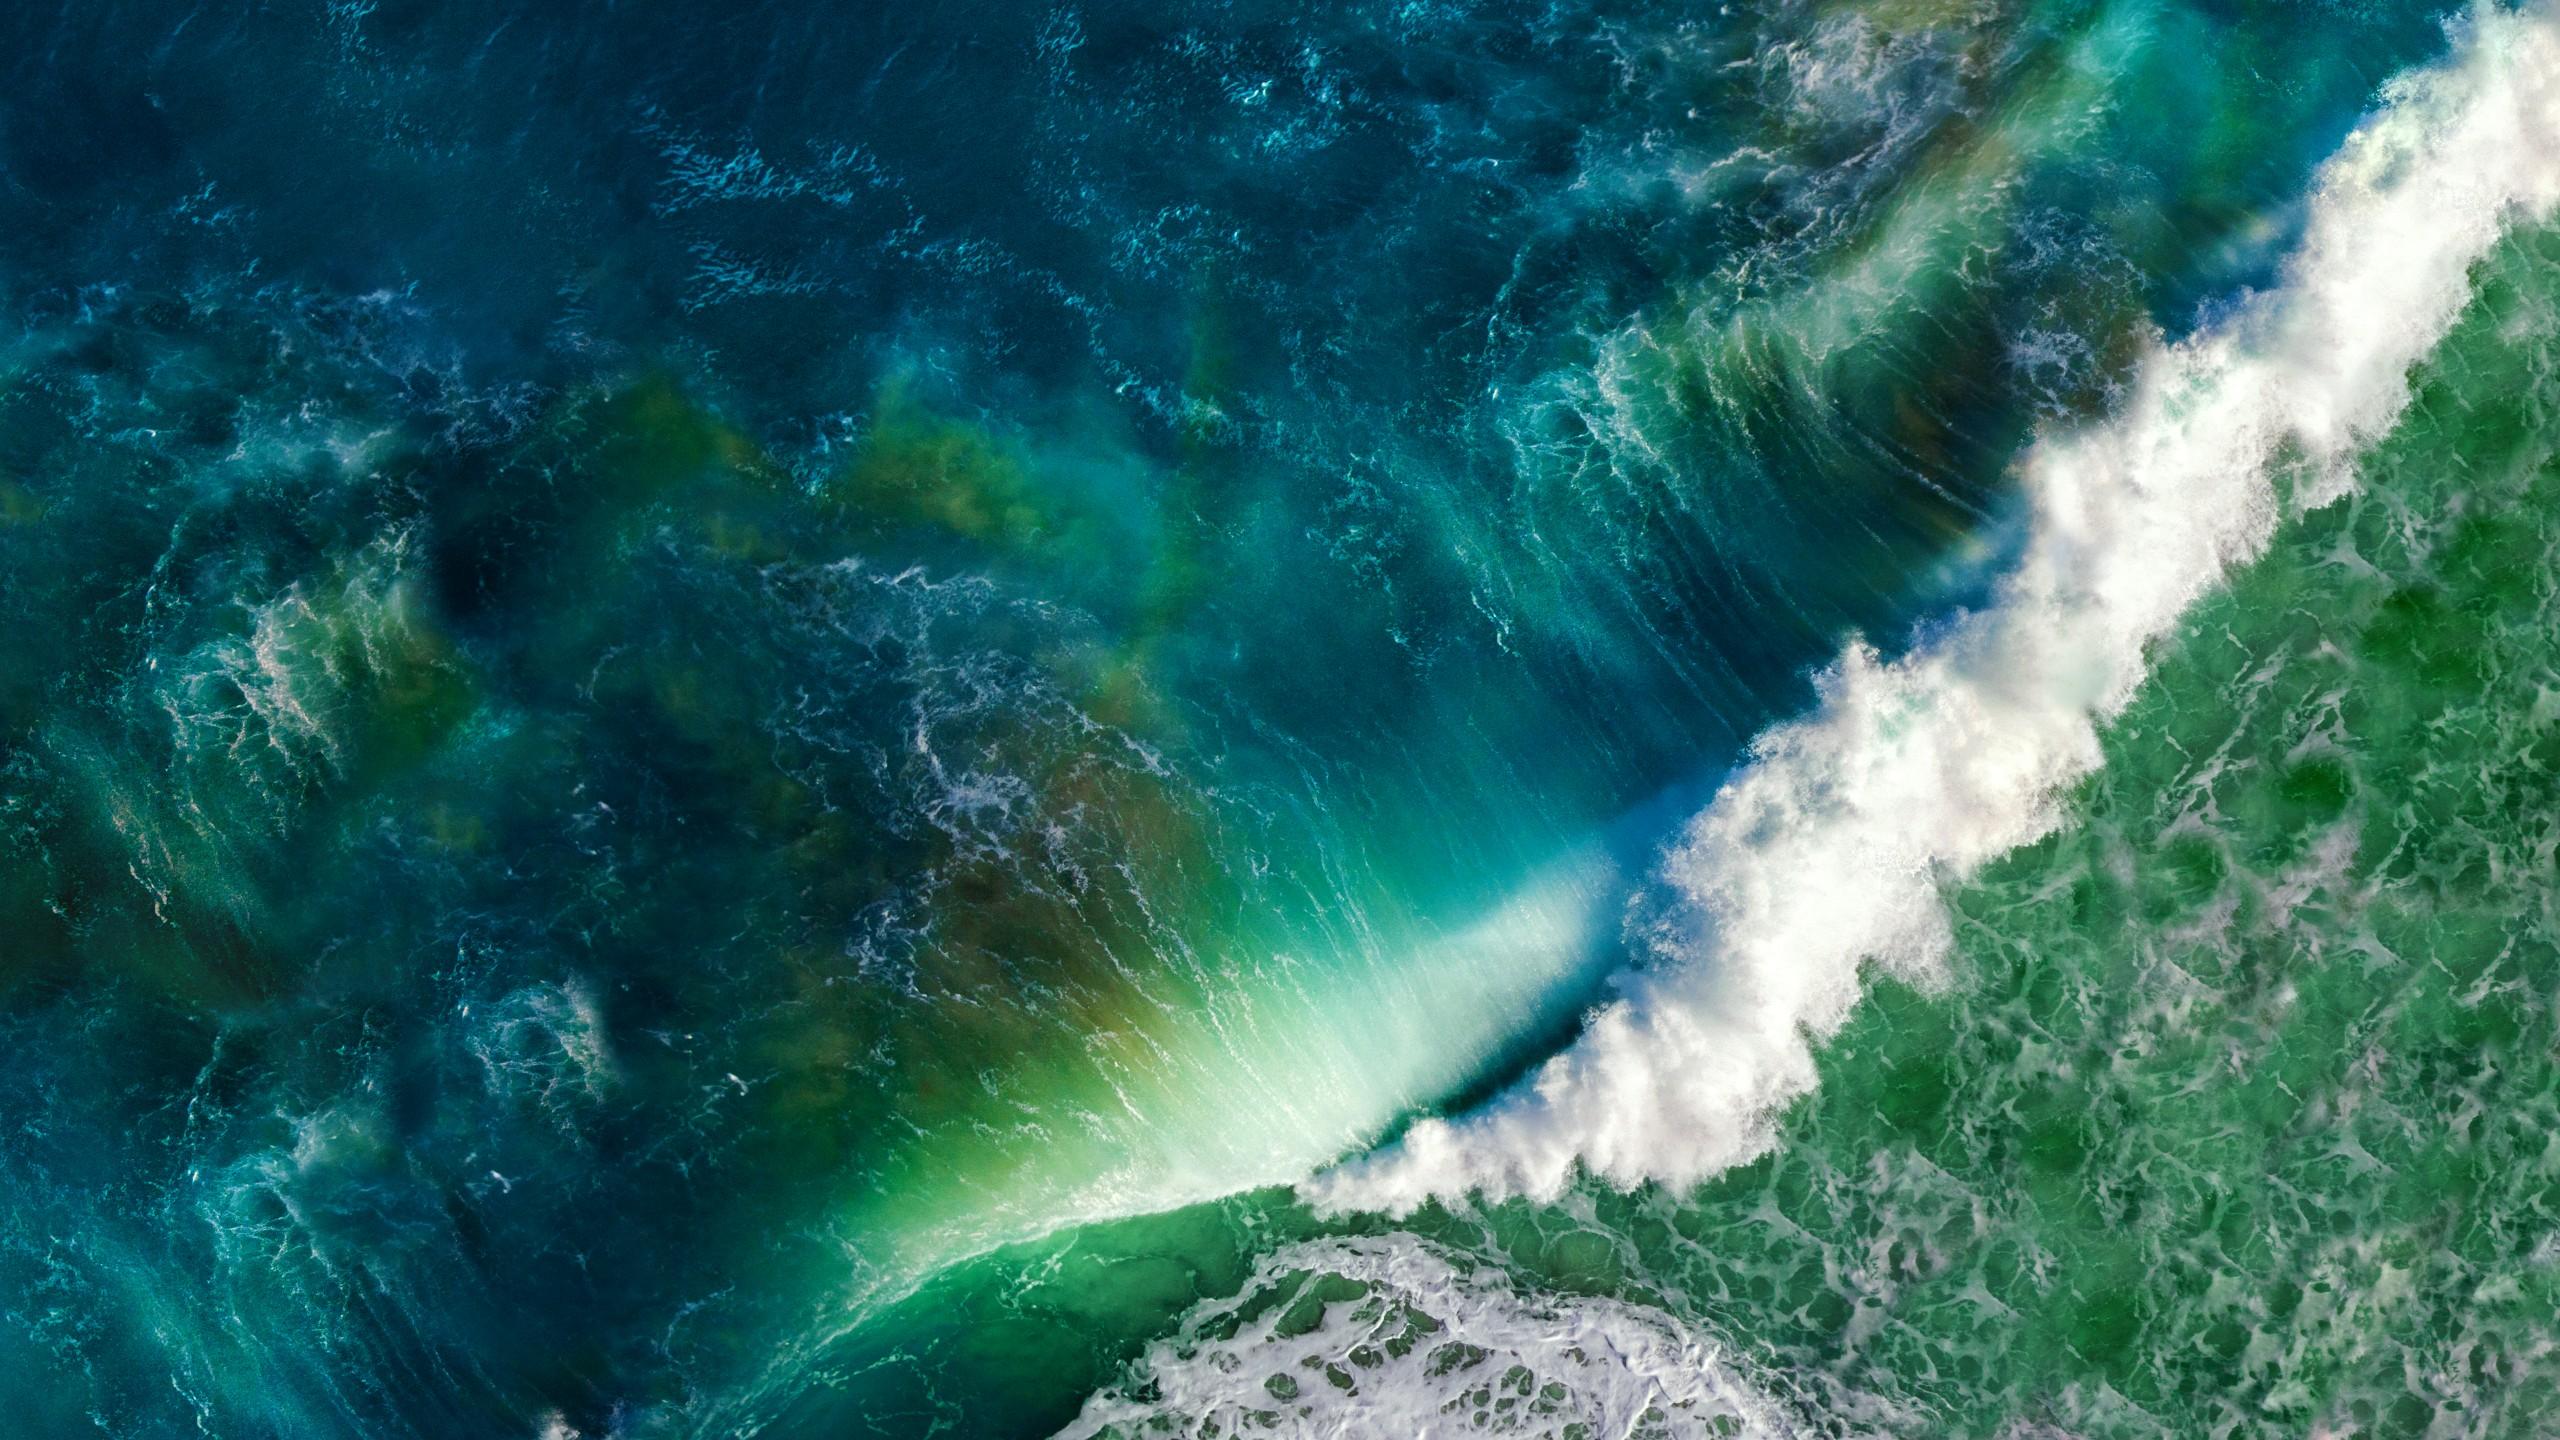 Falls Wallpaper Waterfall Ocean Waves Ios Stock 5k Wallpapers Hd Wallpapers Id